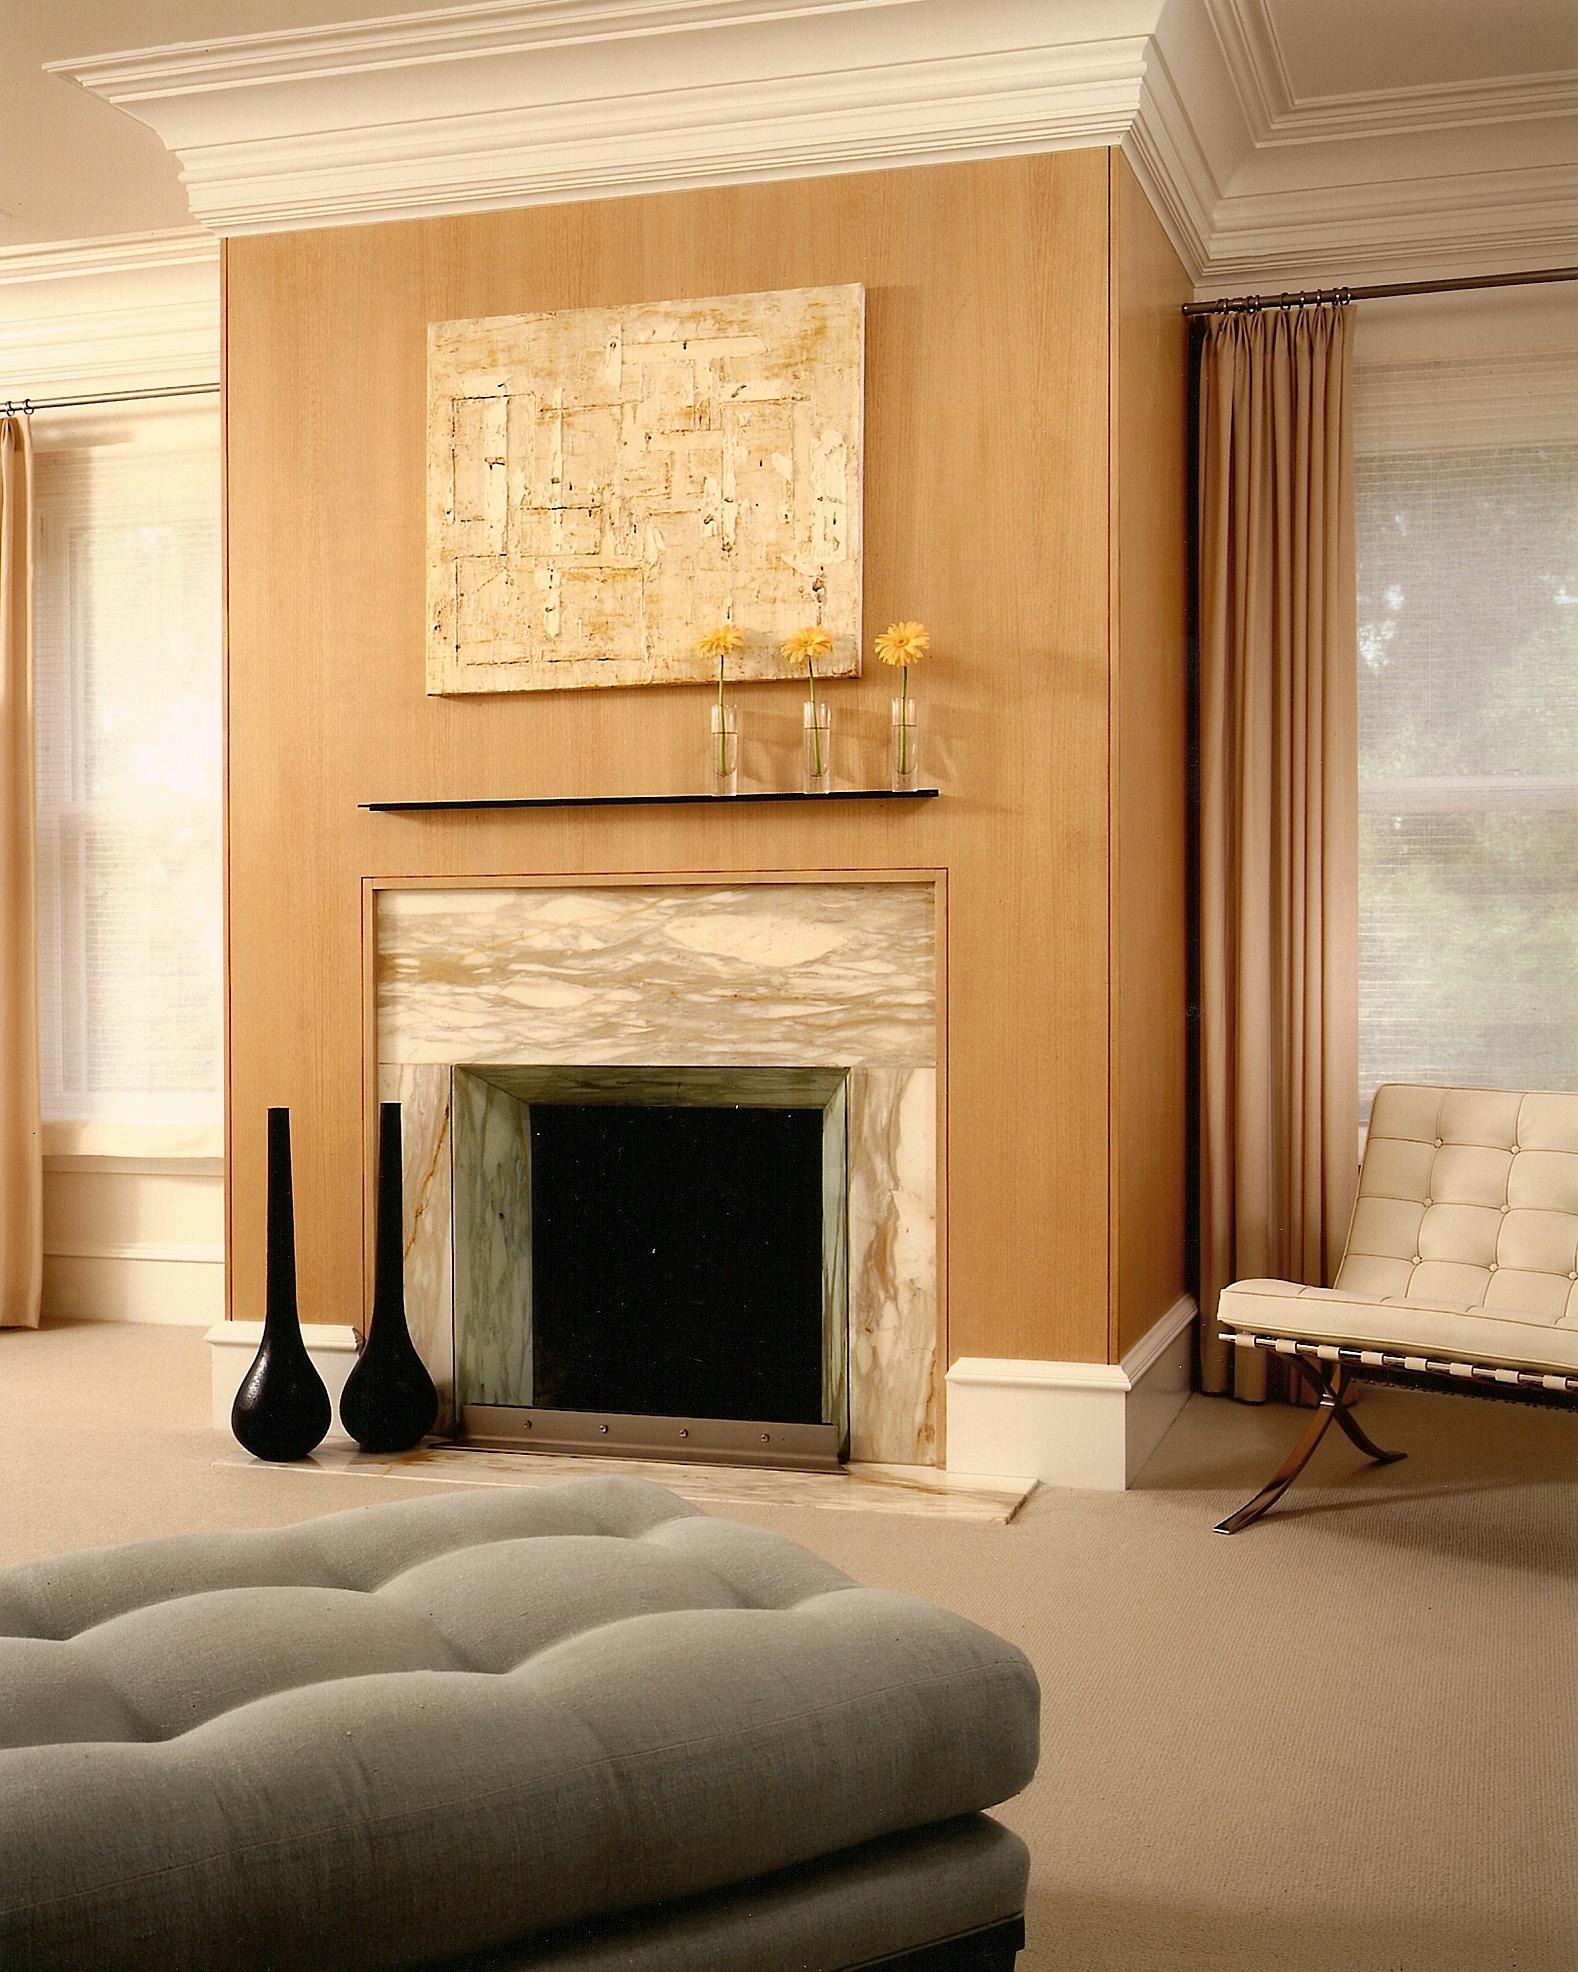 Orleans - master bedroom fireplace.jpg